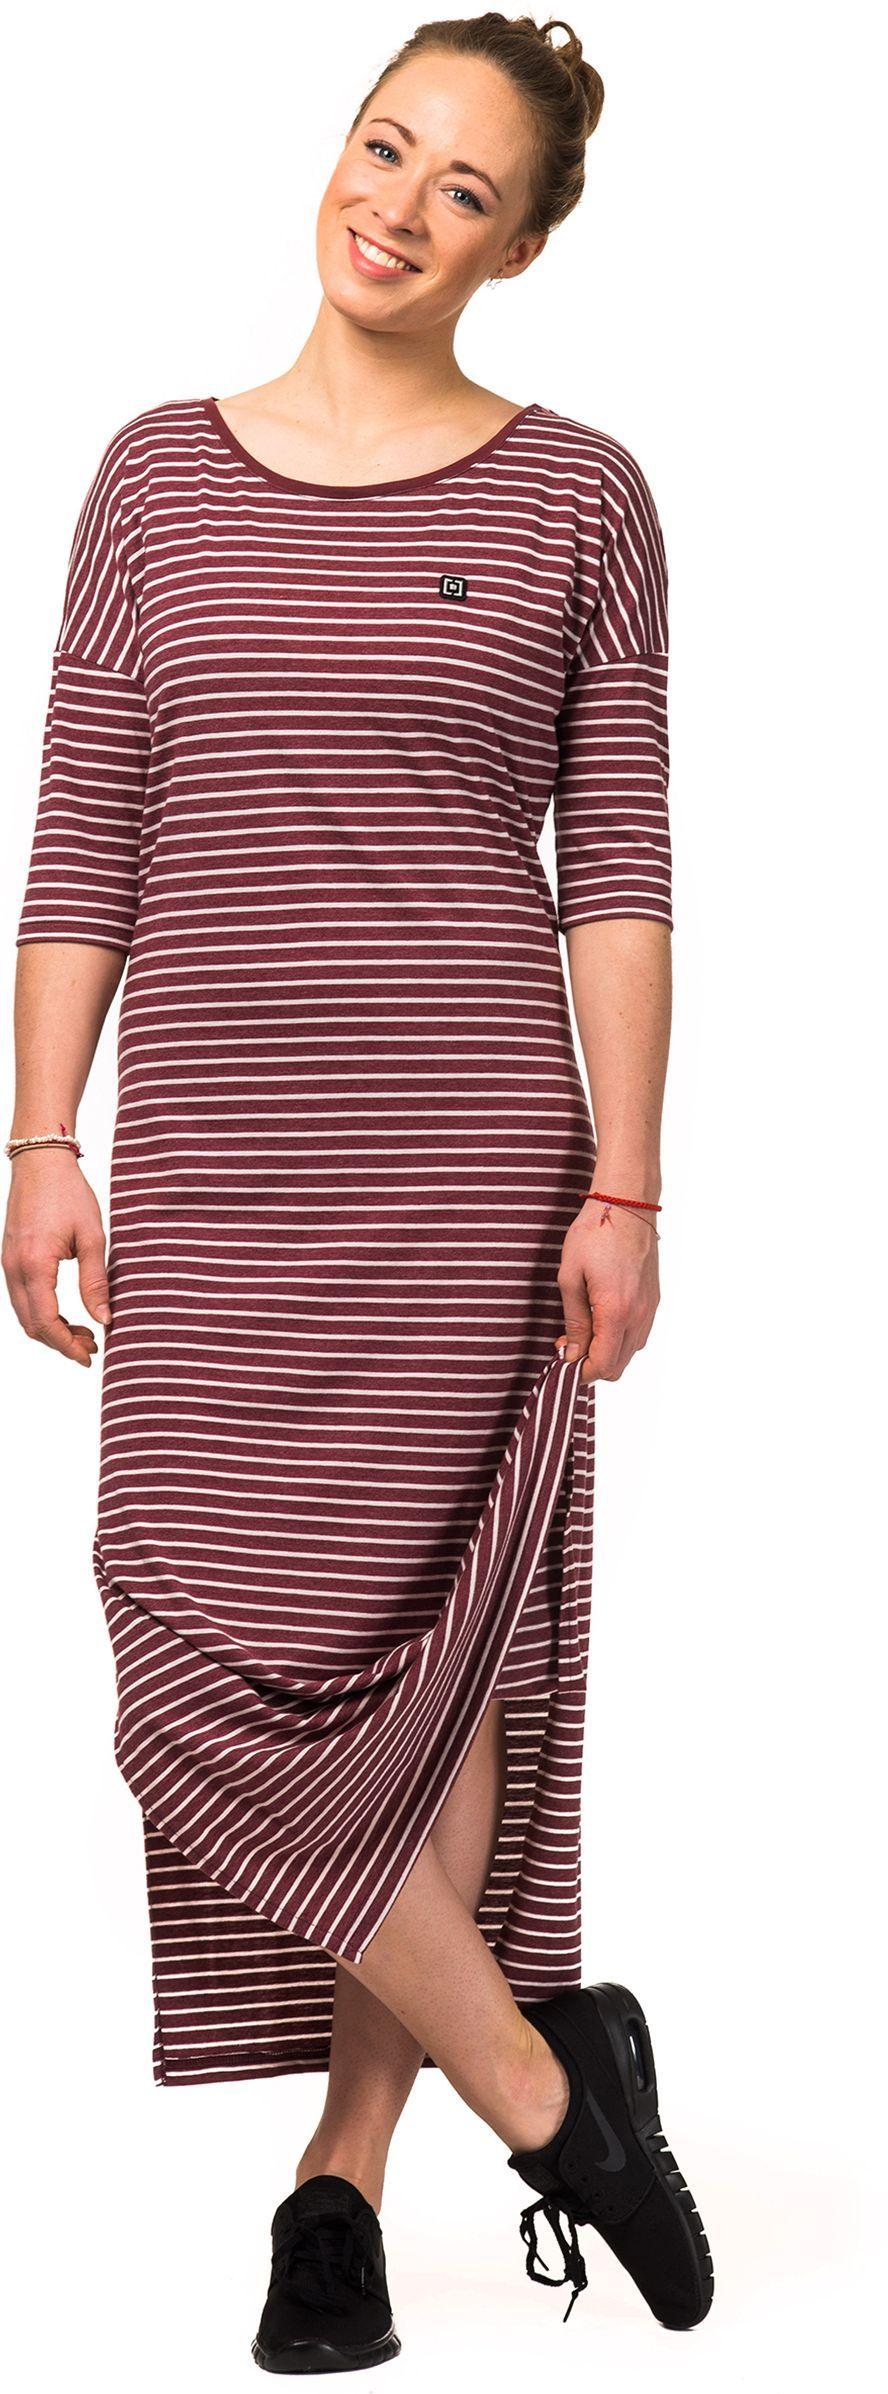 sukienka damska HORSEFEATHERS LILLIAN DRESS (burgundy stripes)